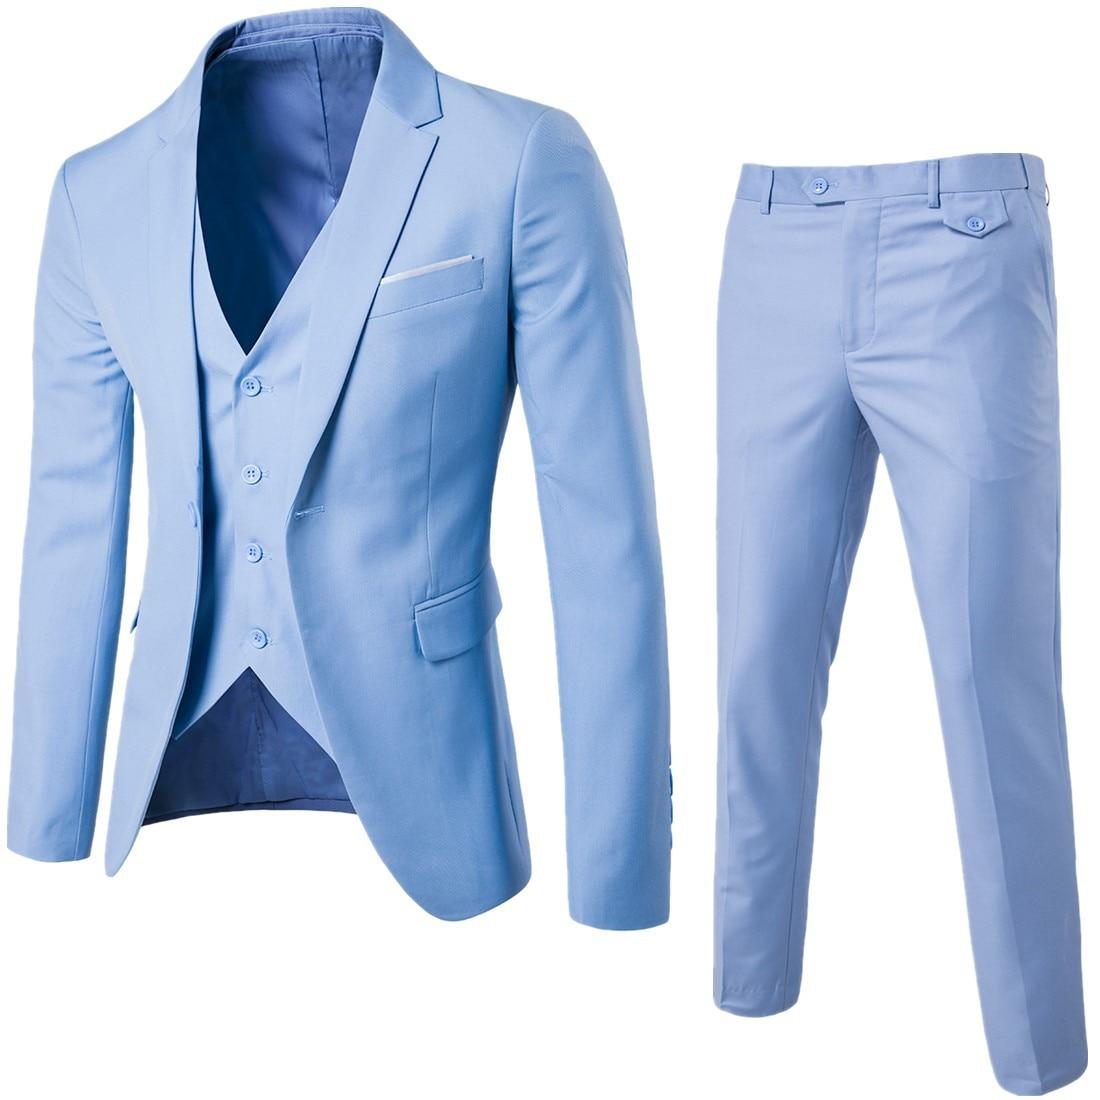 Suit Men Autumn And Winter Slim Fit Three-piece Set Groom Wedding Dress Marriage Best Man Suit Men's Wear Formal Wear